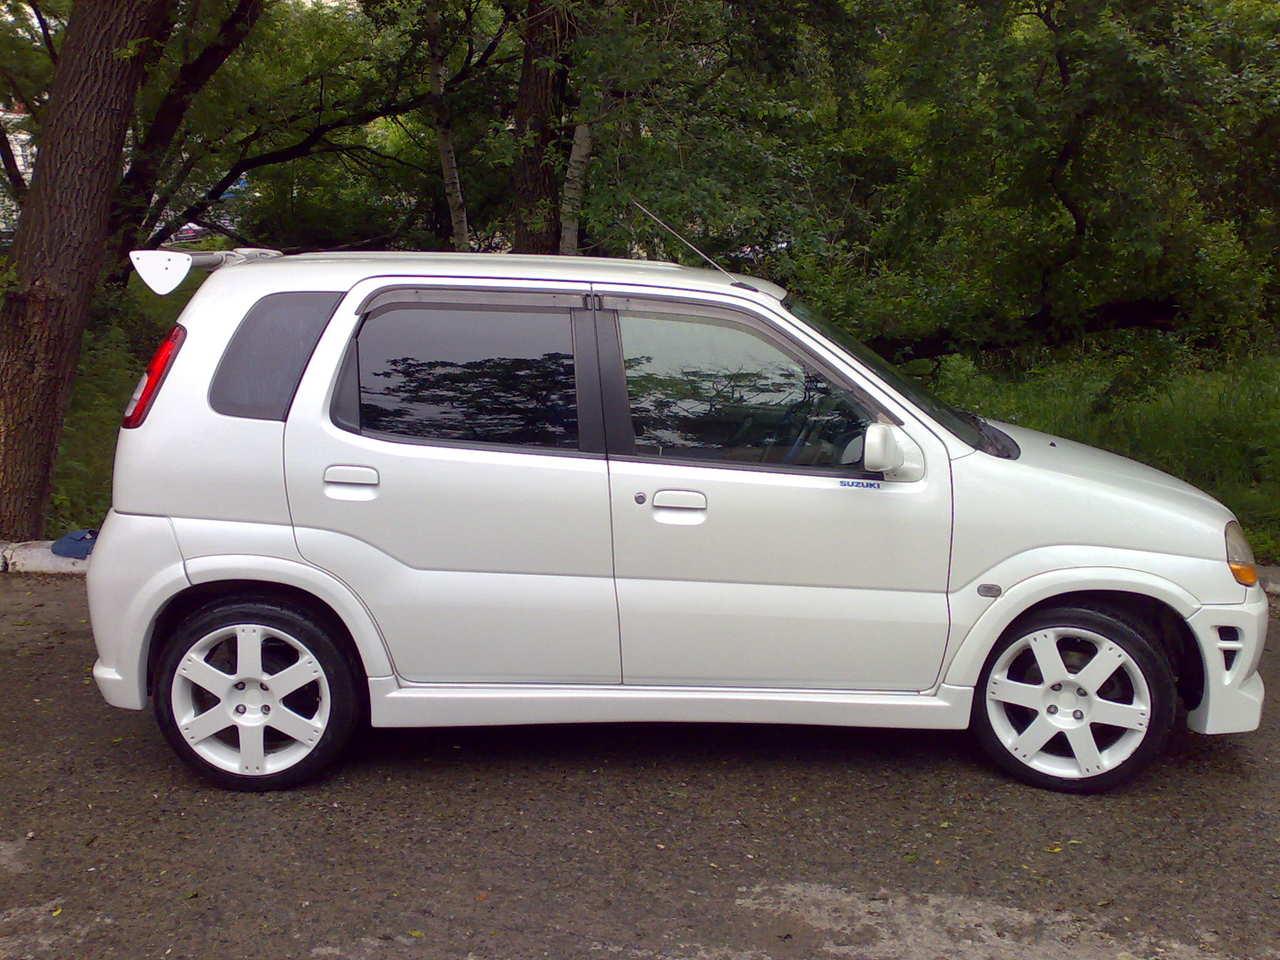 2001 suzuki swift photos 1 3 gasoline ff automatic for sale rh cars directory net Suzuki Swift 2004 Suzuki Swift 2004